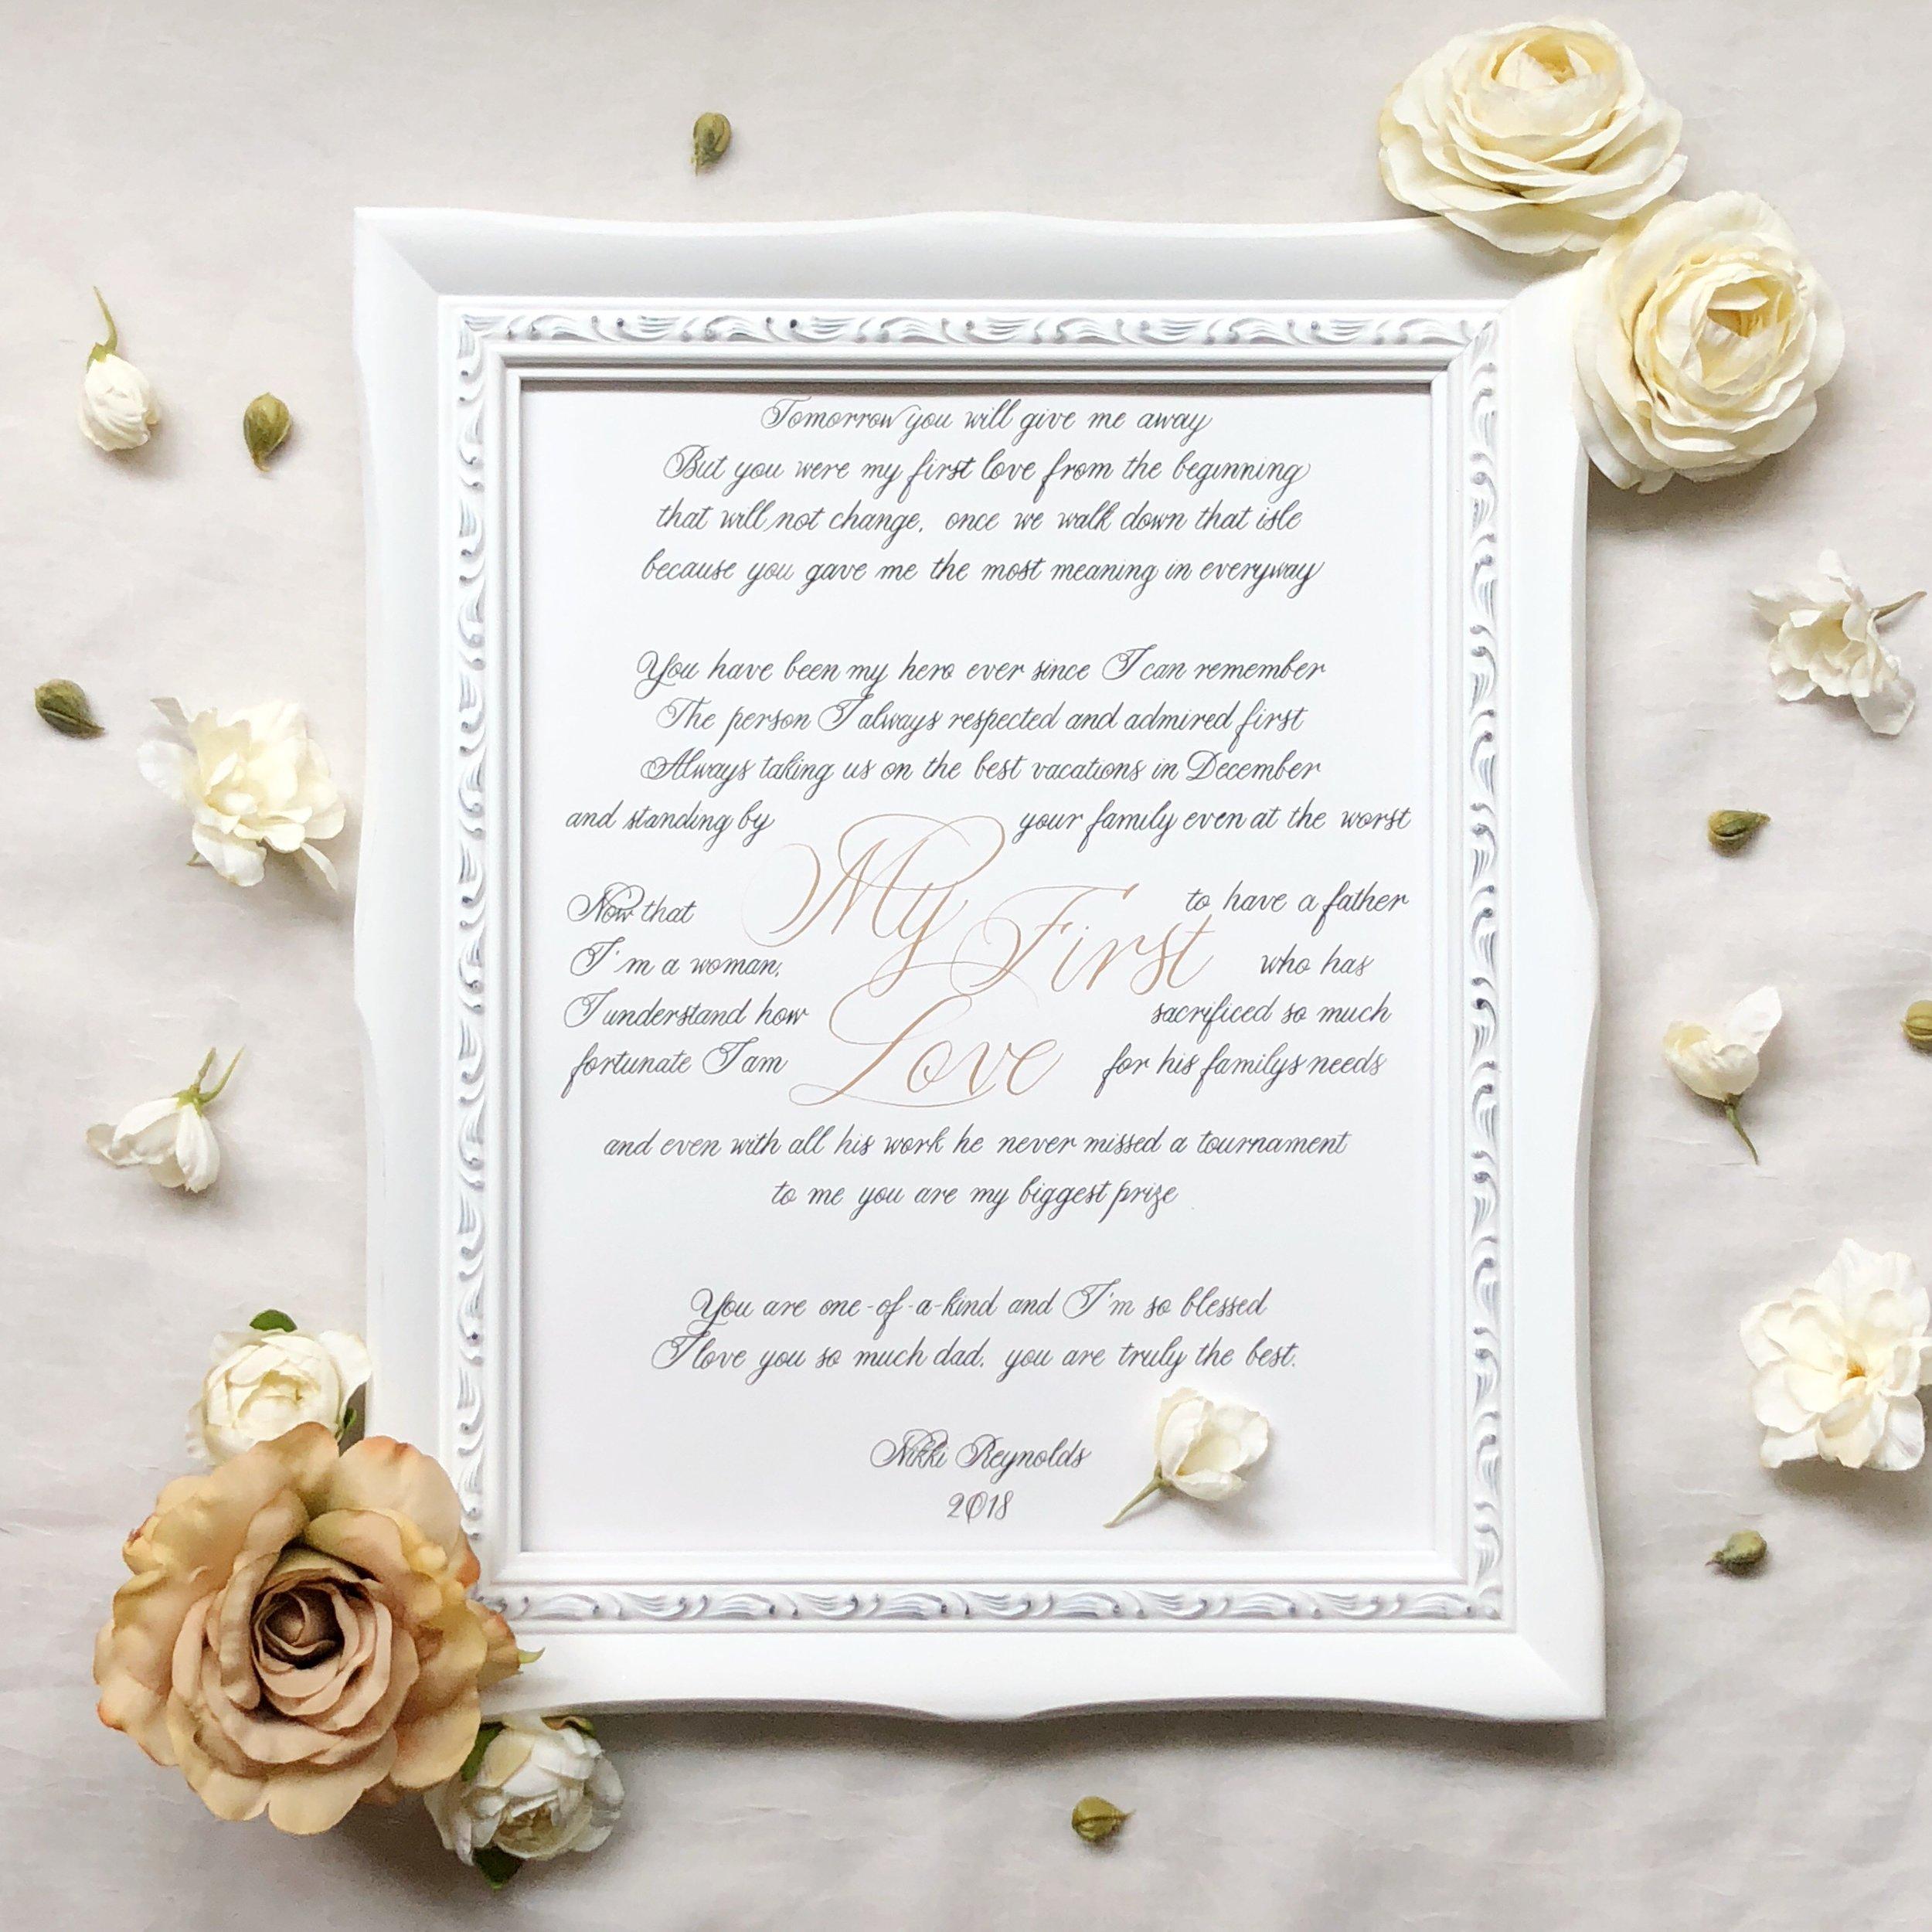 Central PA, York PA, JesSmith Designs, custom, wedding, invitations, bridal, Harrisburg, hanover, calligraphy, baltimore, wedding invitations, lancaster, gettysburg, 09-12 14.58.51.jpg